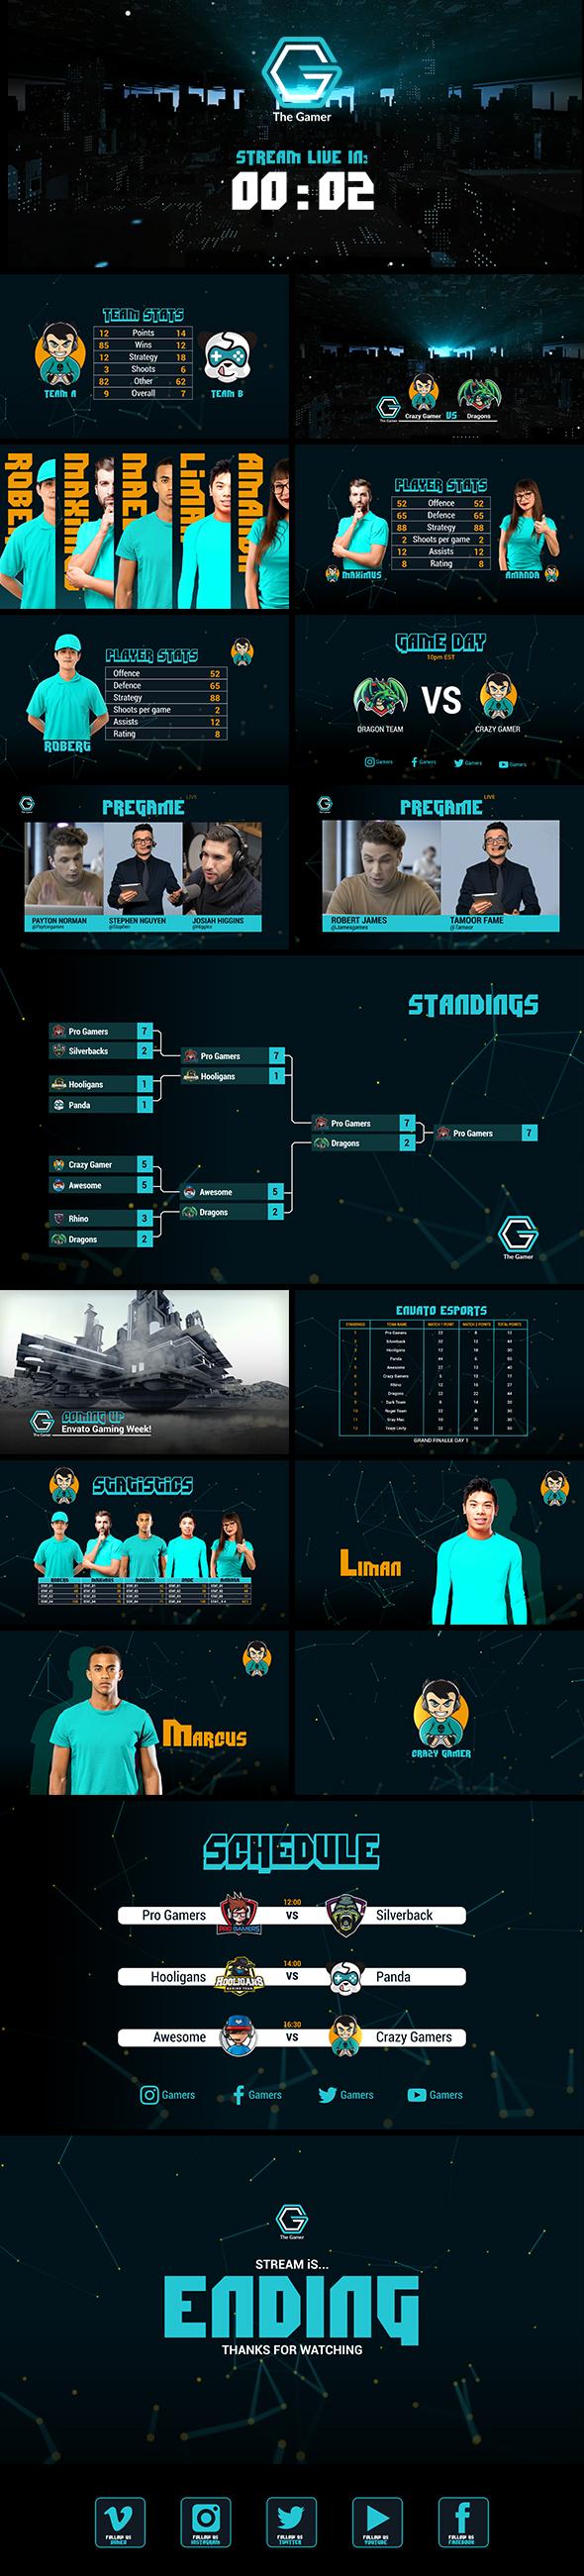 Gamer Esport Broadcast Package - 5